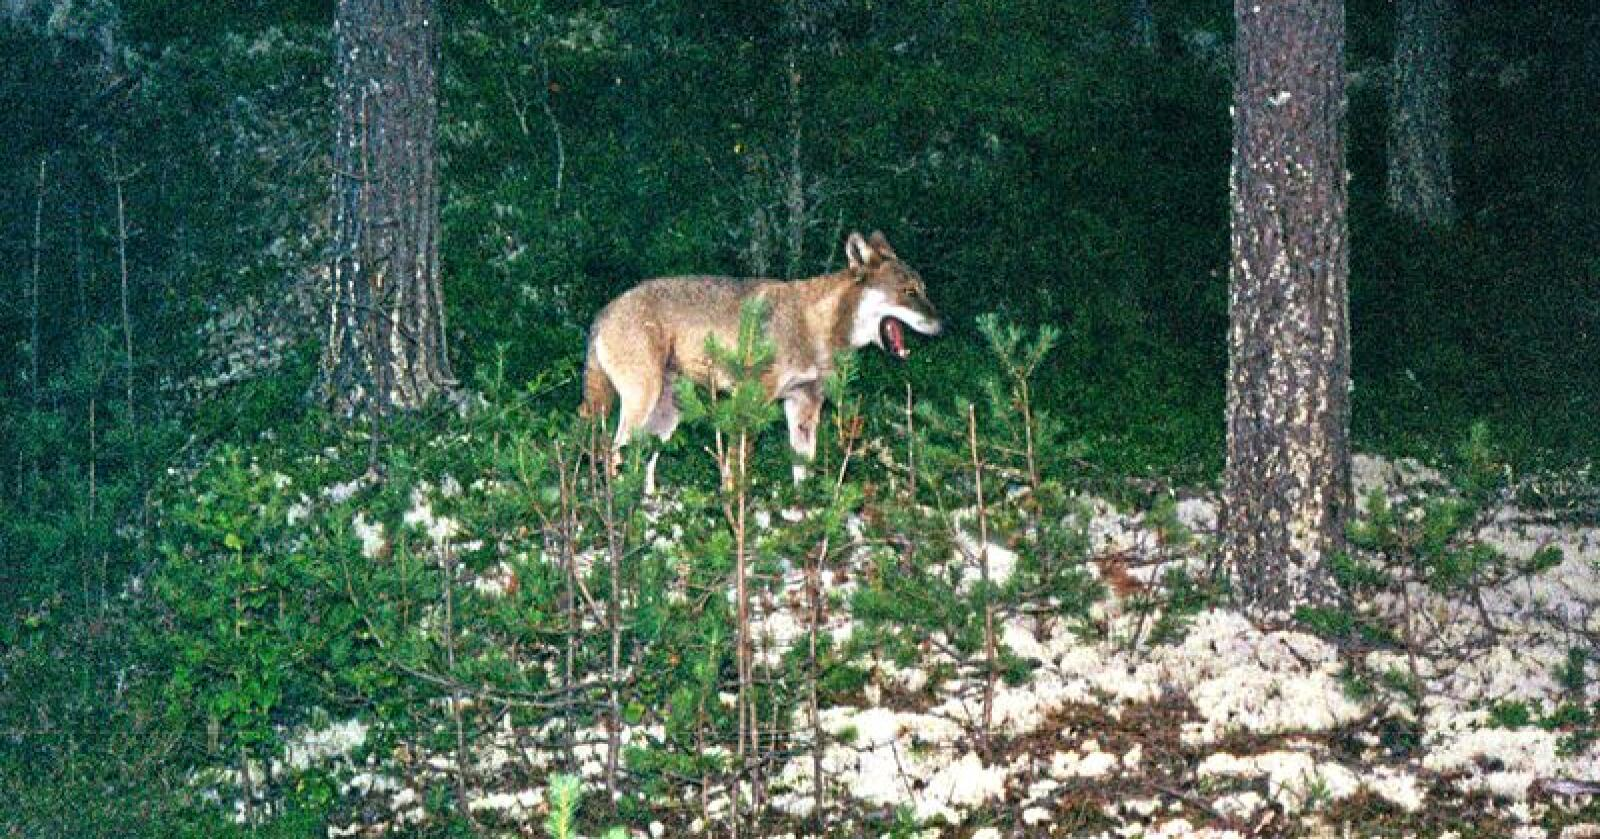 DNA fra mange ulver langt tilbake i tid skal analyseres i et prosjekt som NTNU Vitenskapsmuseet setter i gang. Her en ulv fotografert i Elverum i 2002. Foto: Vegard Moberget/NTB SCANPIX